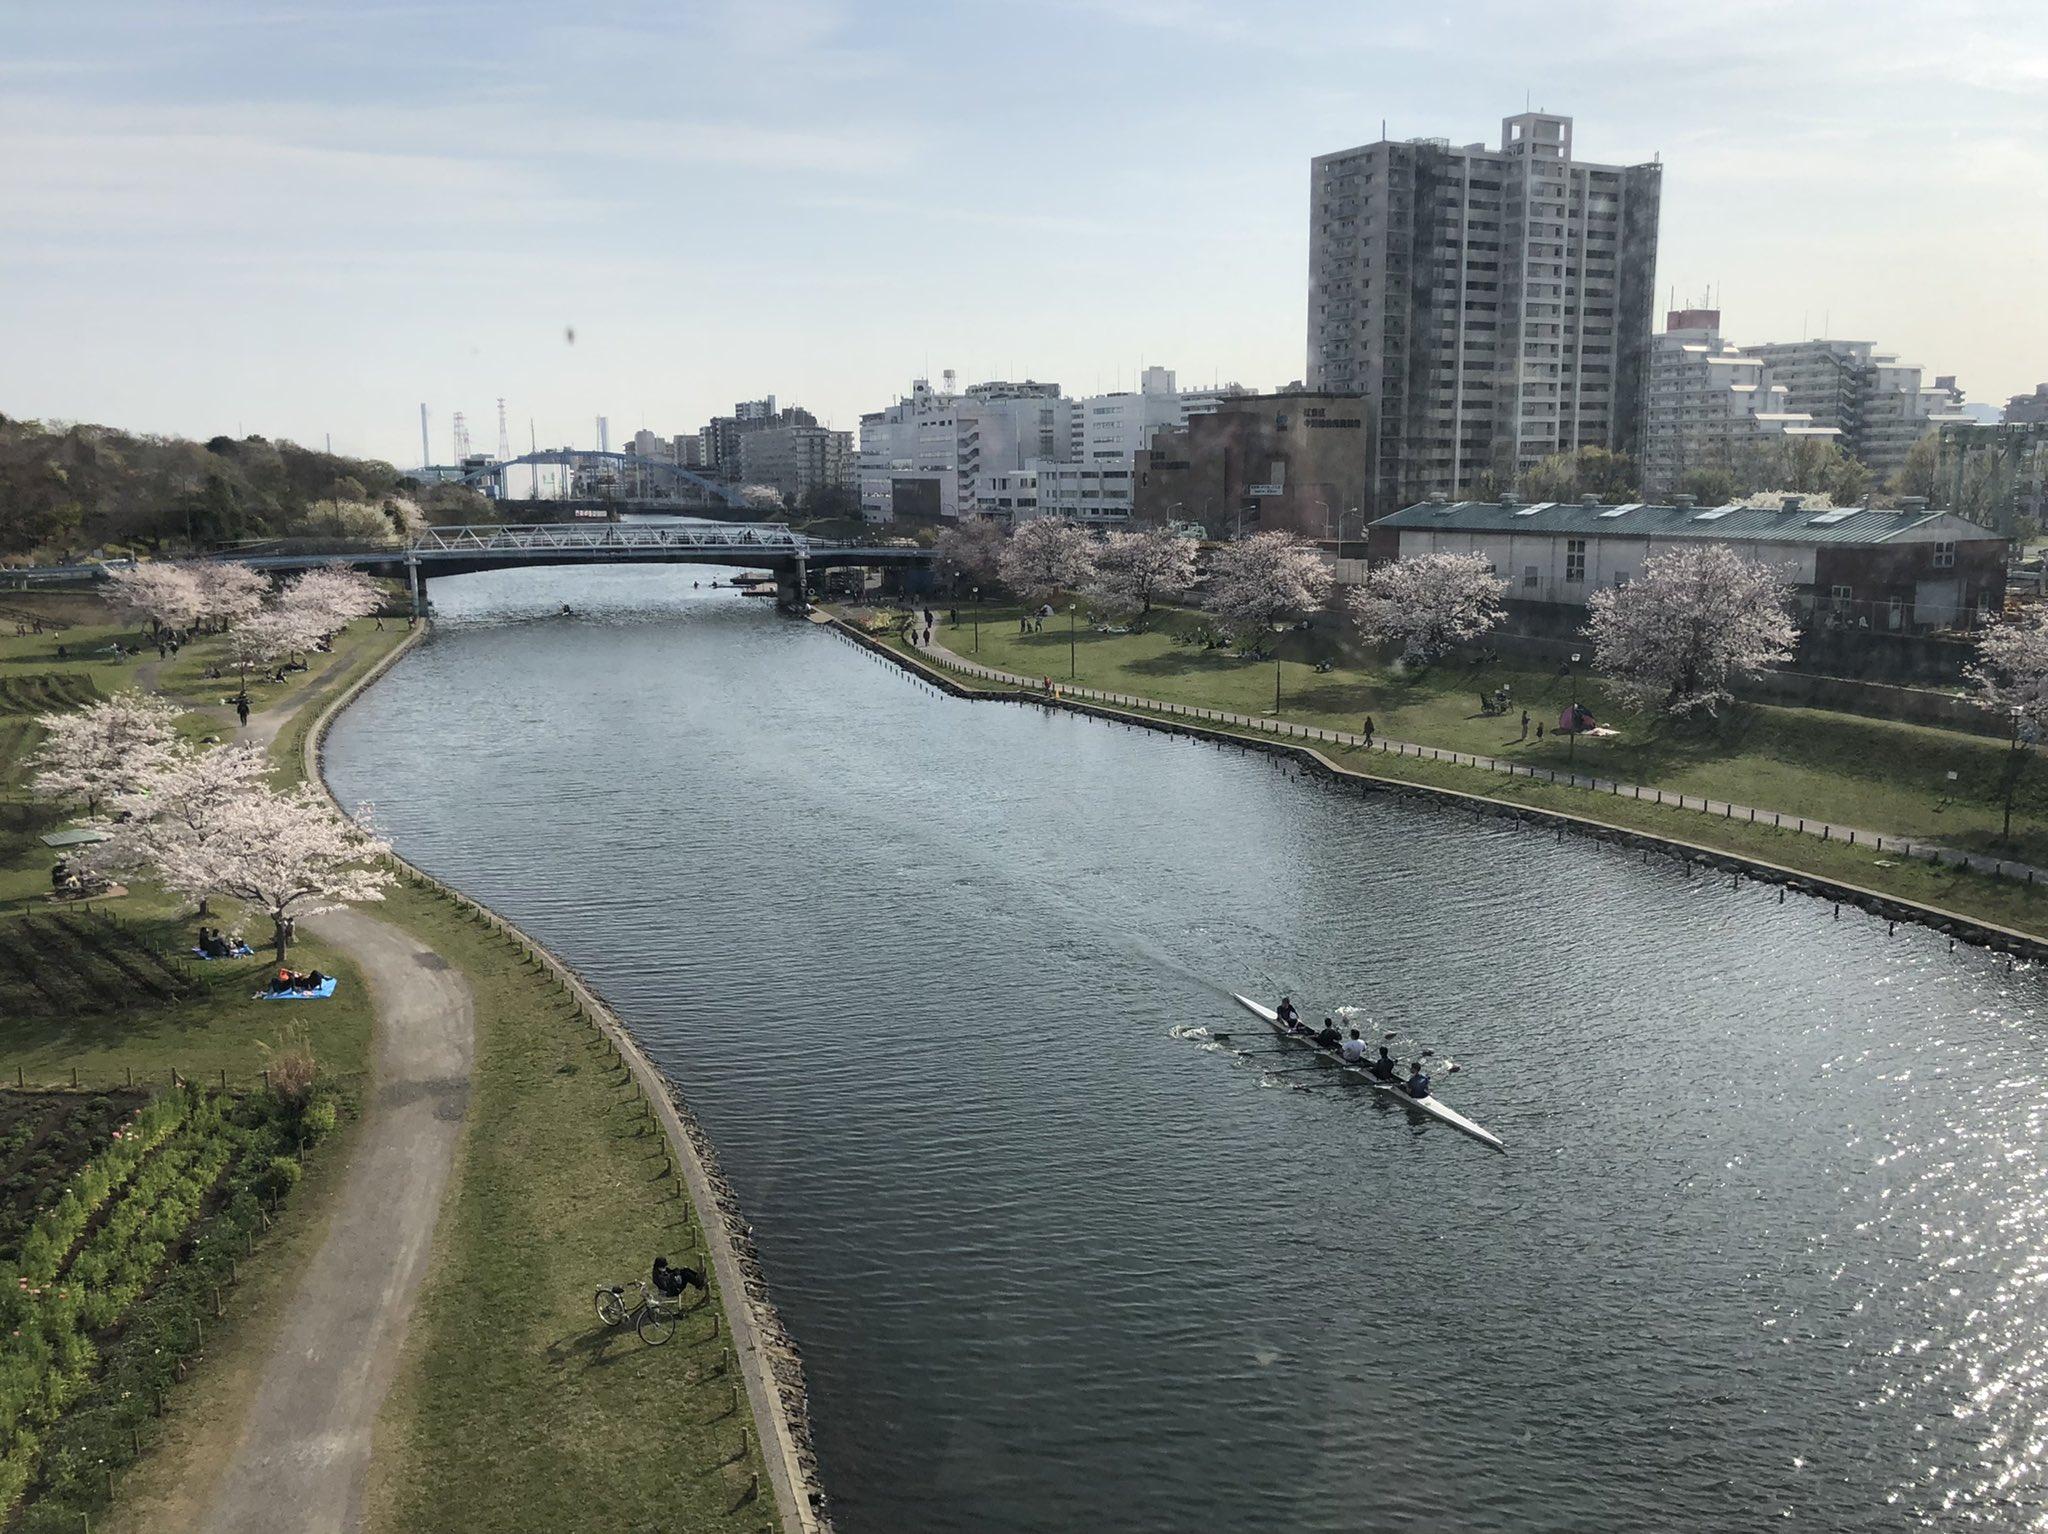 Río Kyu-Nakagawa en abril de 2021